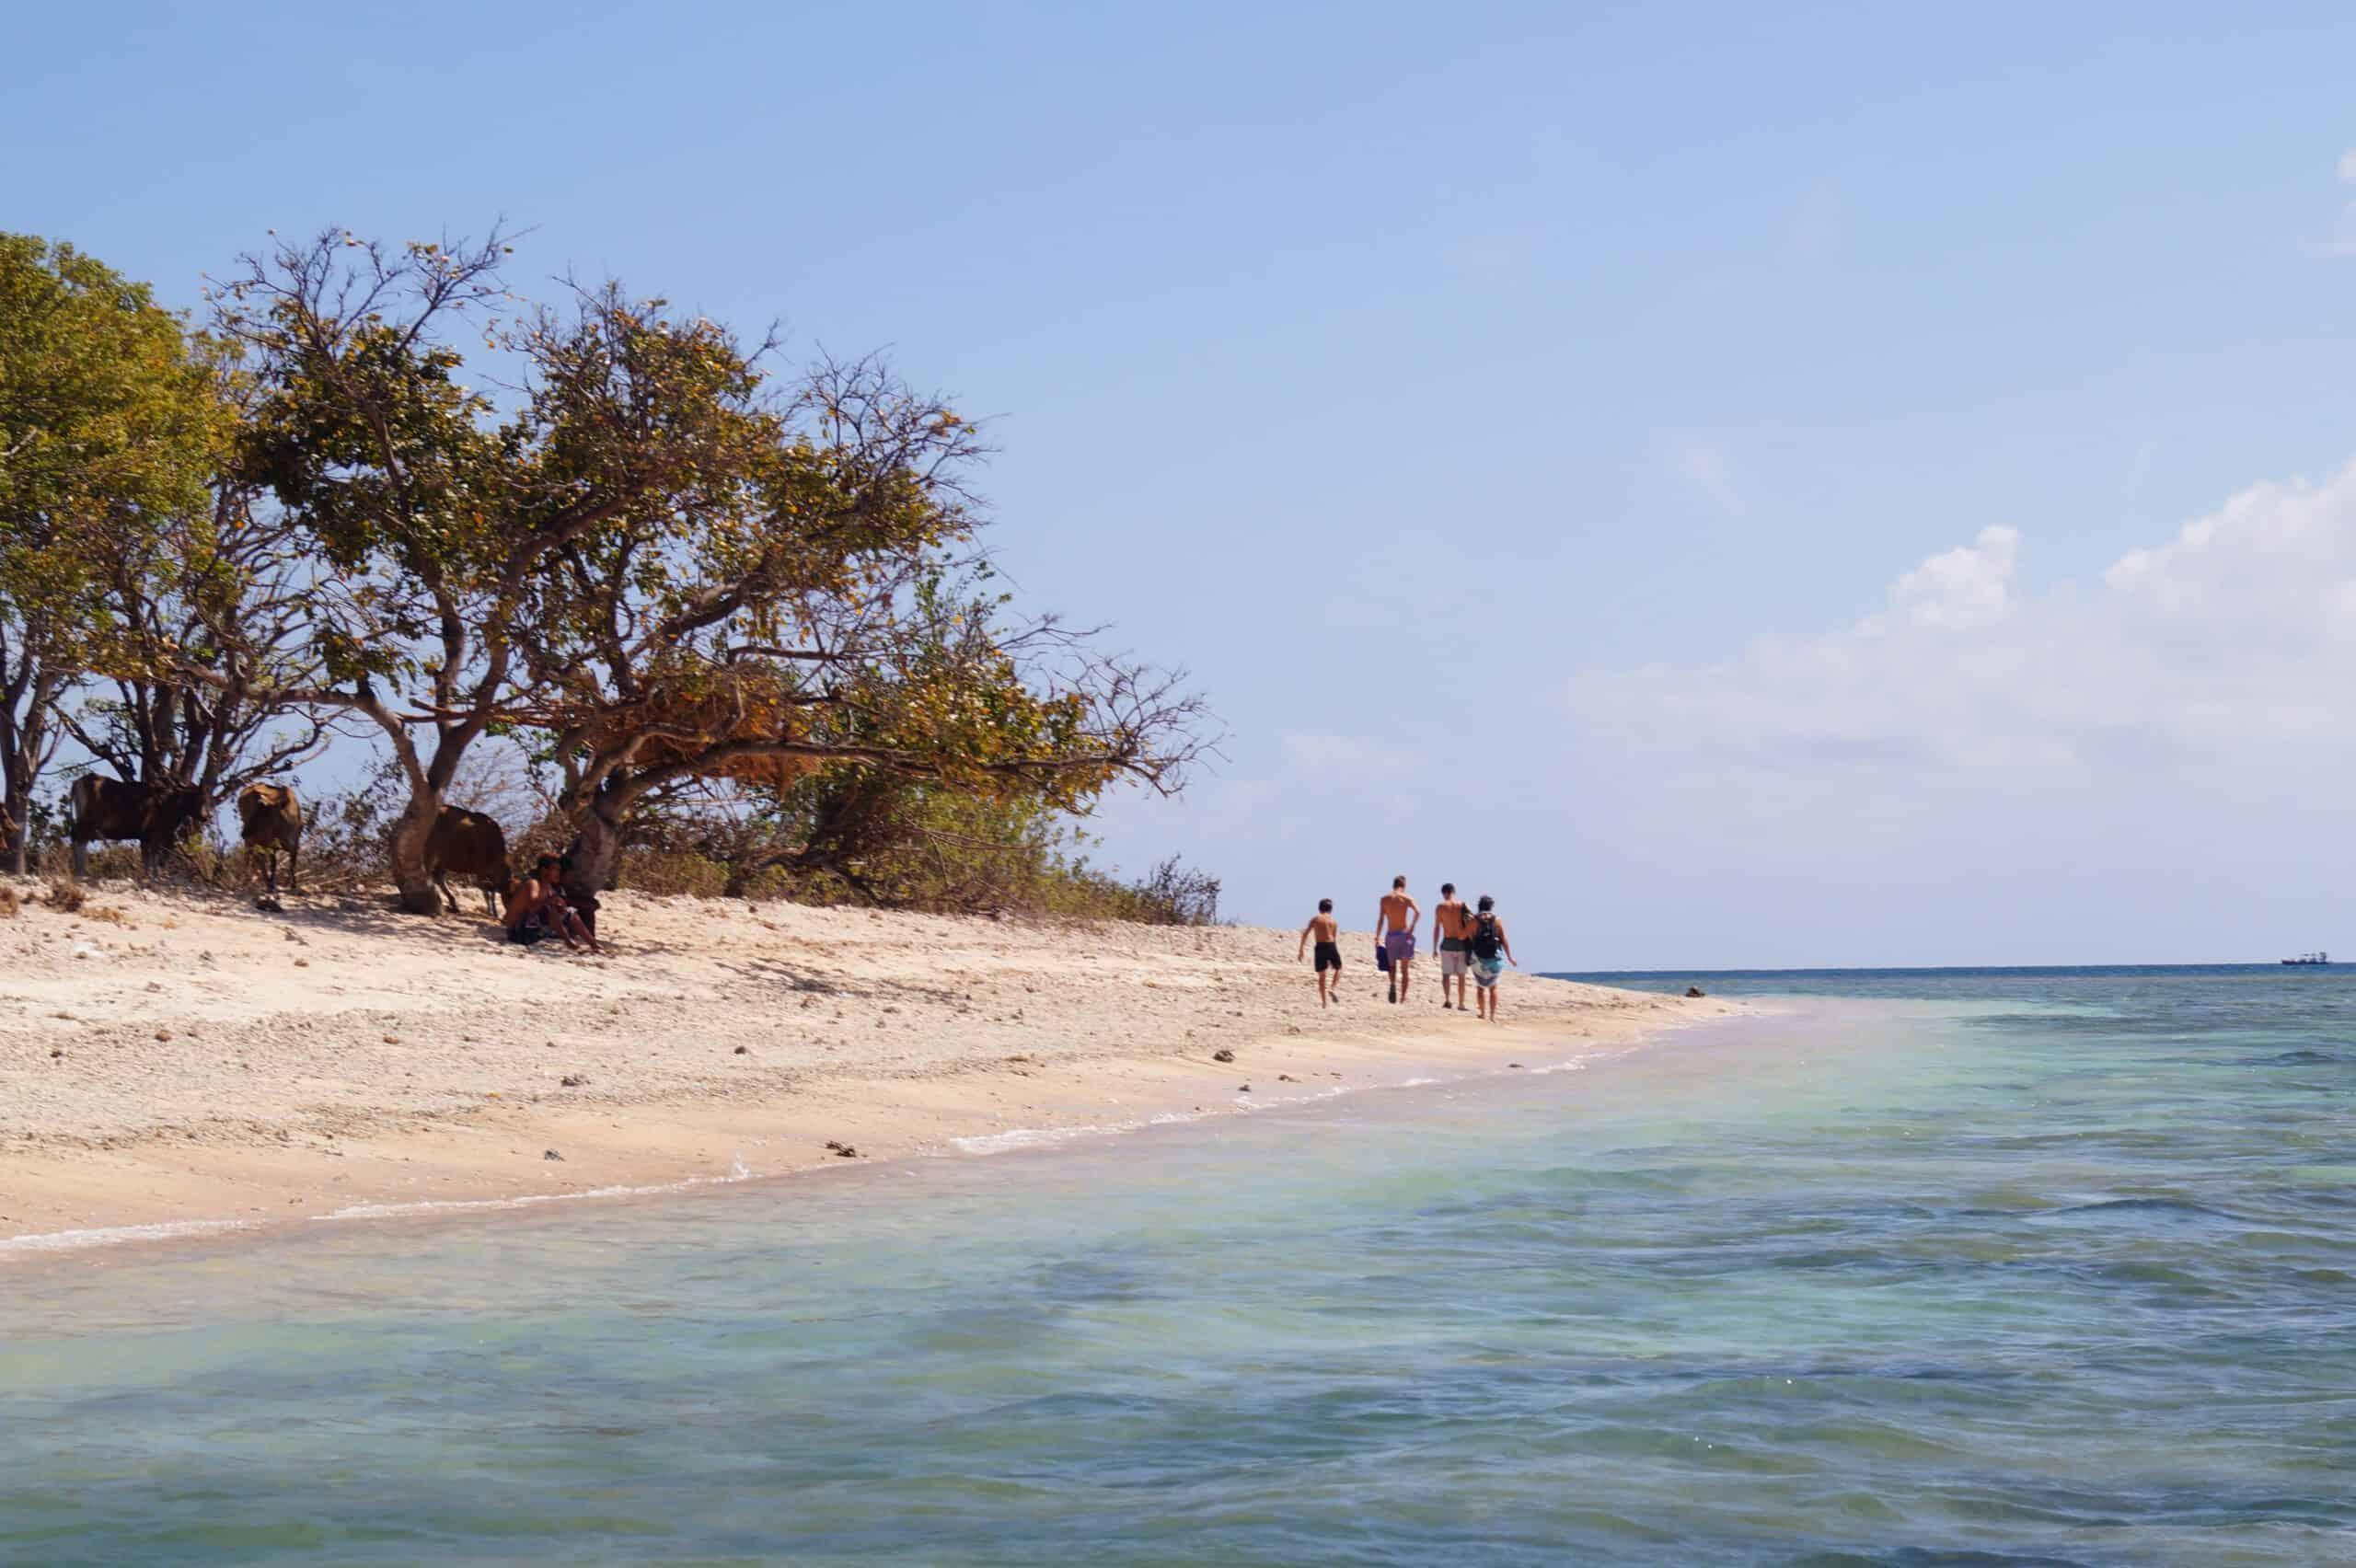 Las Gilis Secretas de Lombok Ruta por las islas scaled - Gili Gede and the Secret Gilis of Lombok, an undiscovered paradise